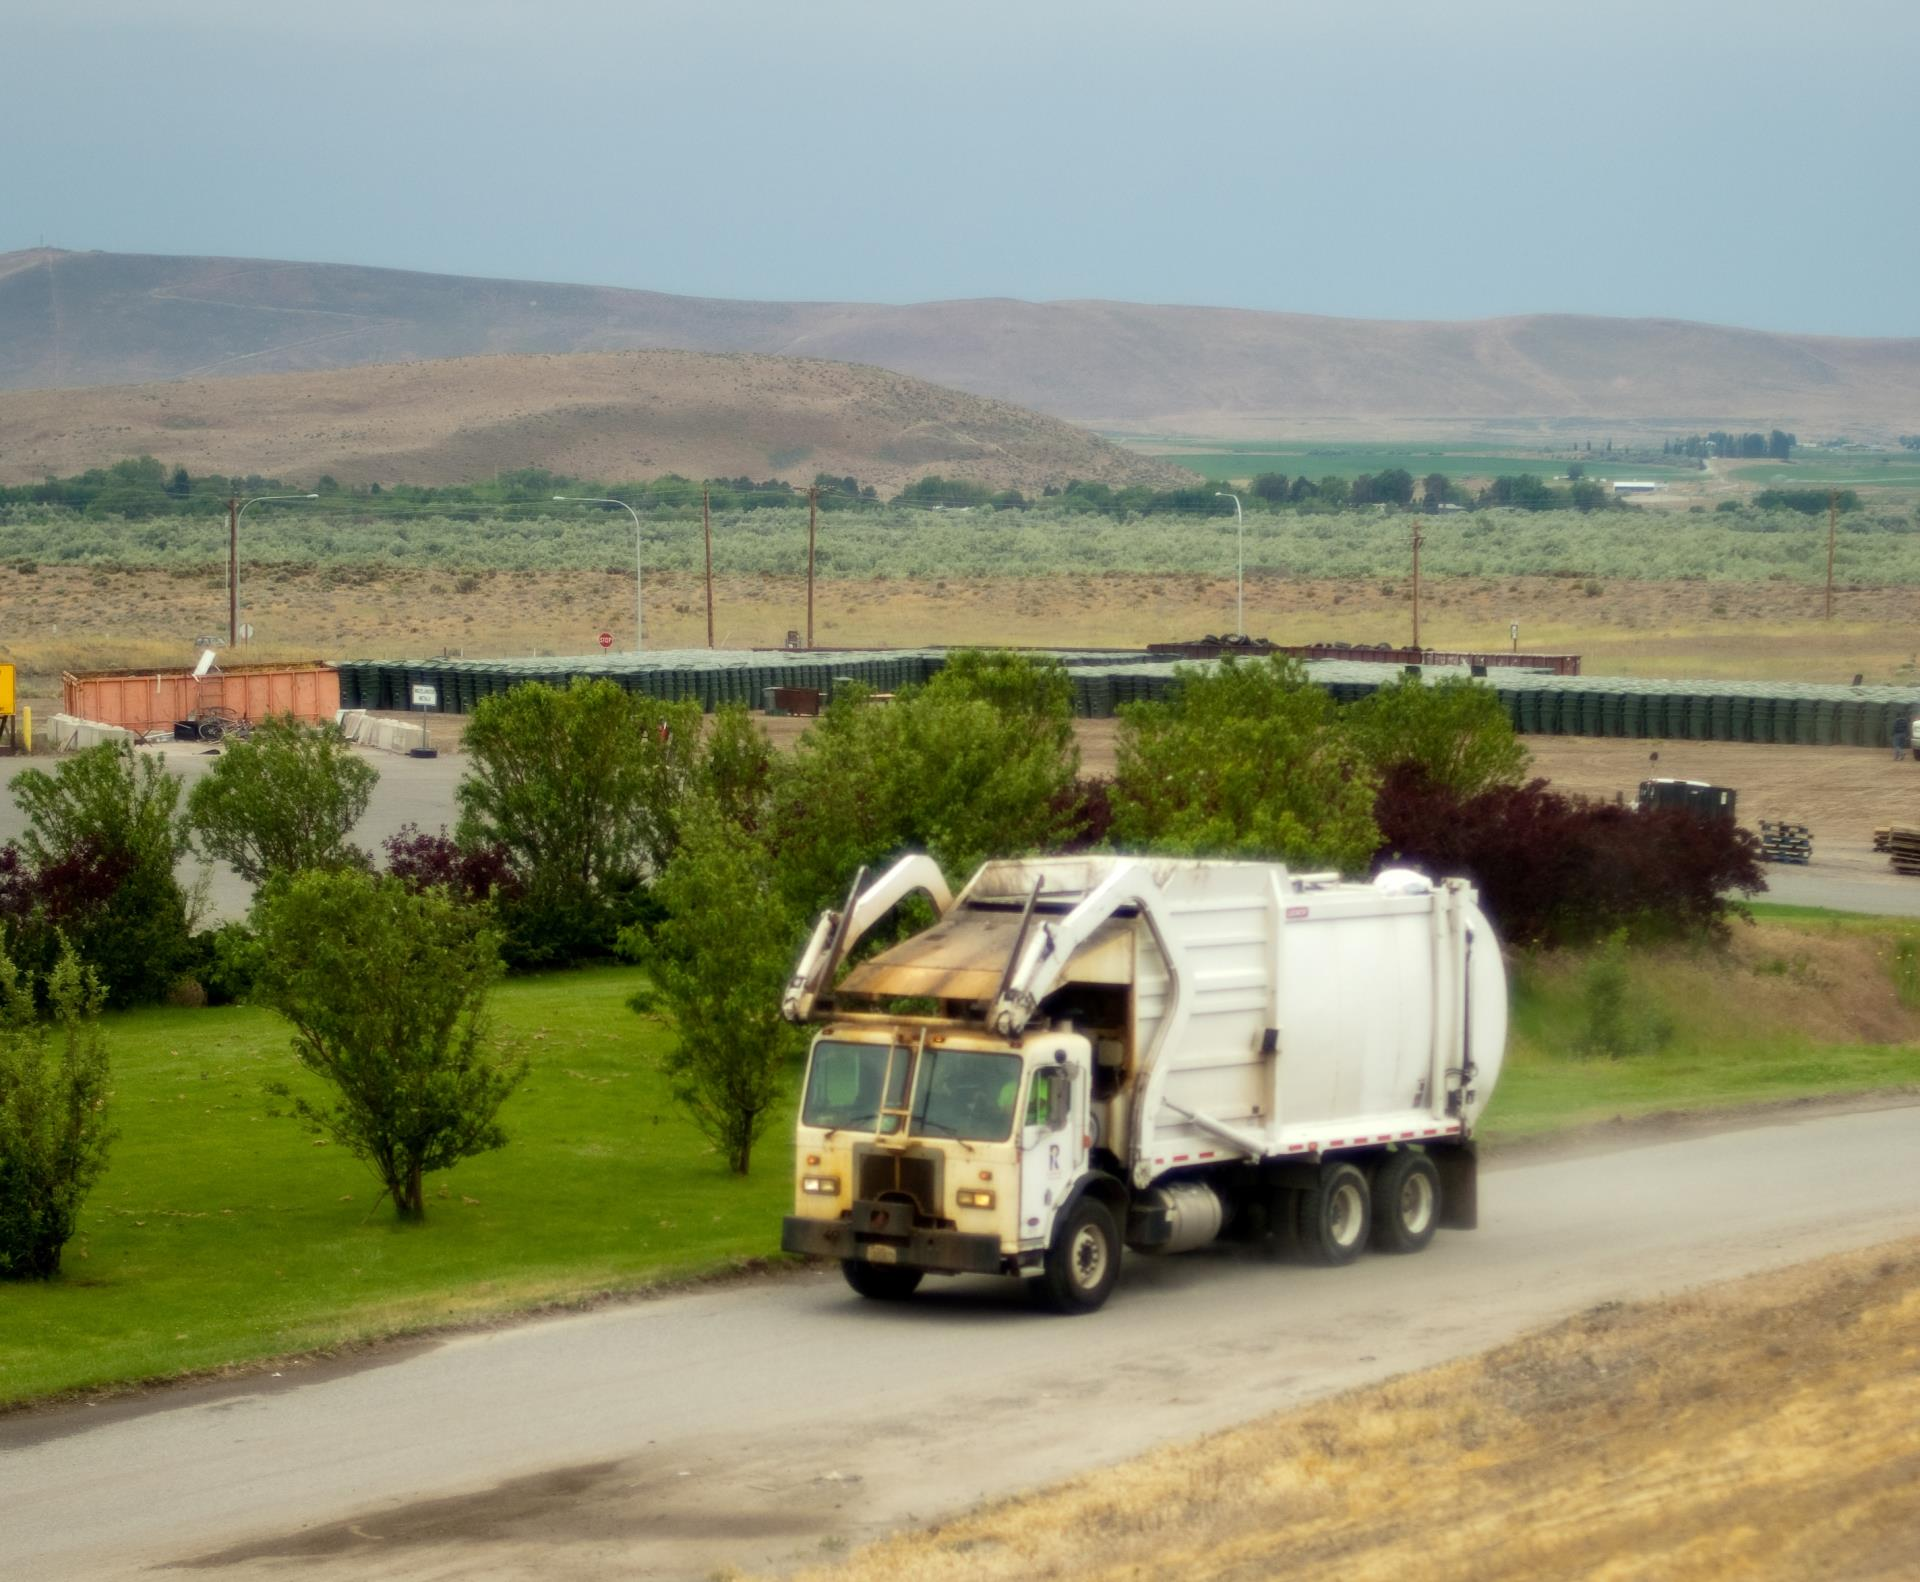 Garbage Truck at Landfill